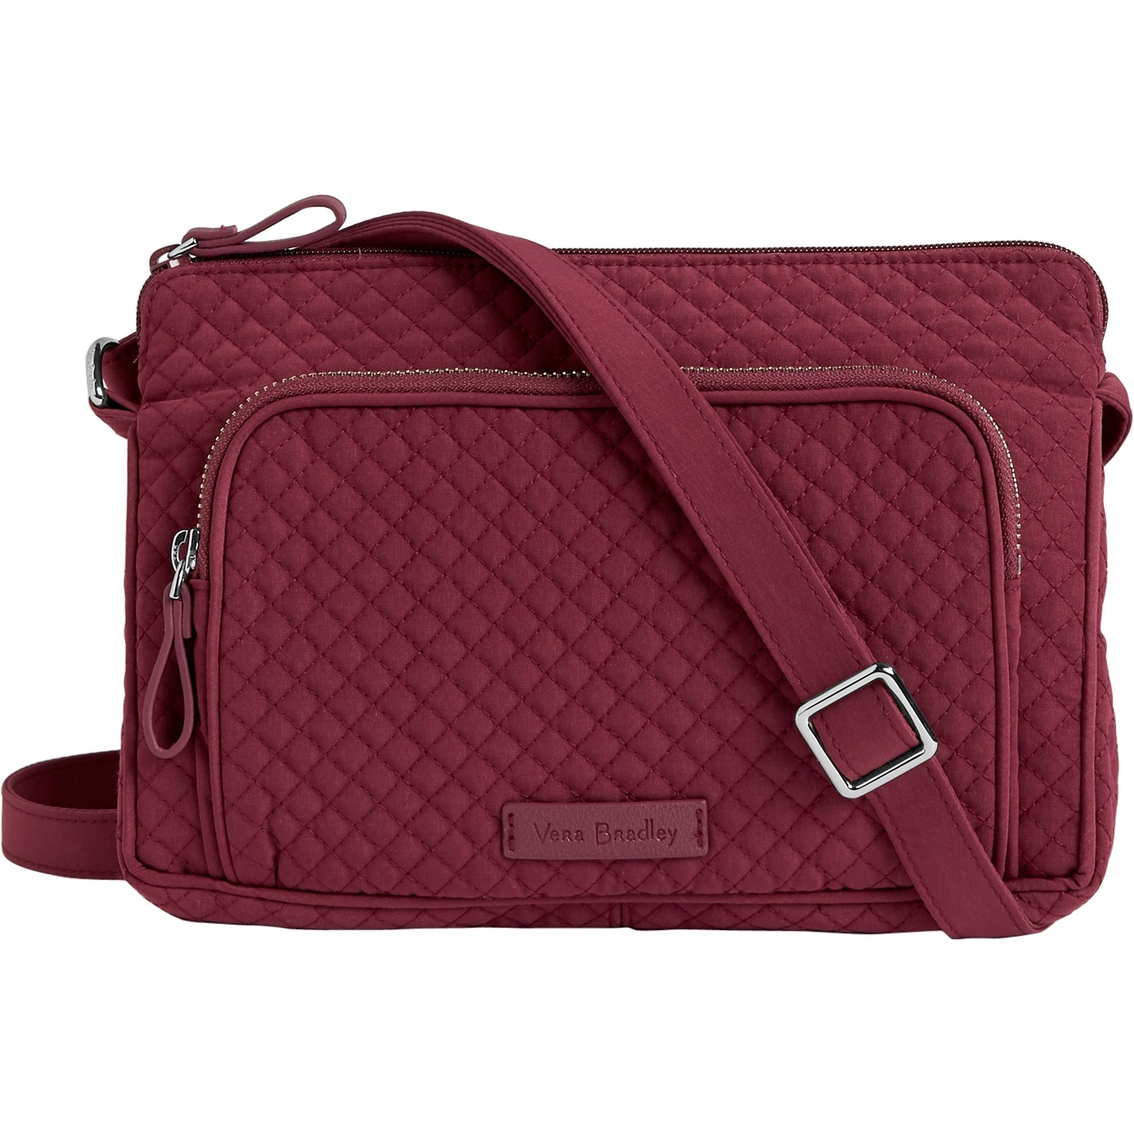 0ec907331906 Vera Bradley Iconic Rfid Little Hipster Handbag, Hawthorne Rose ...